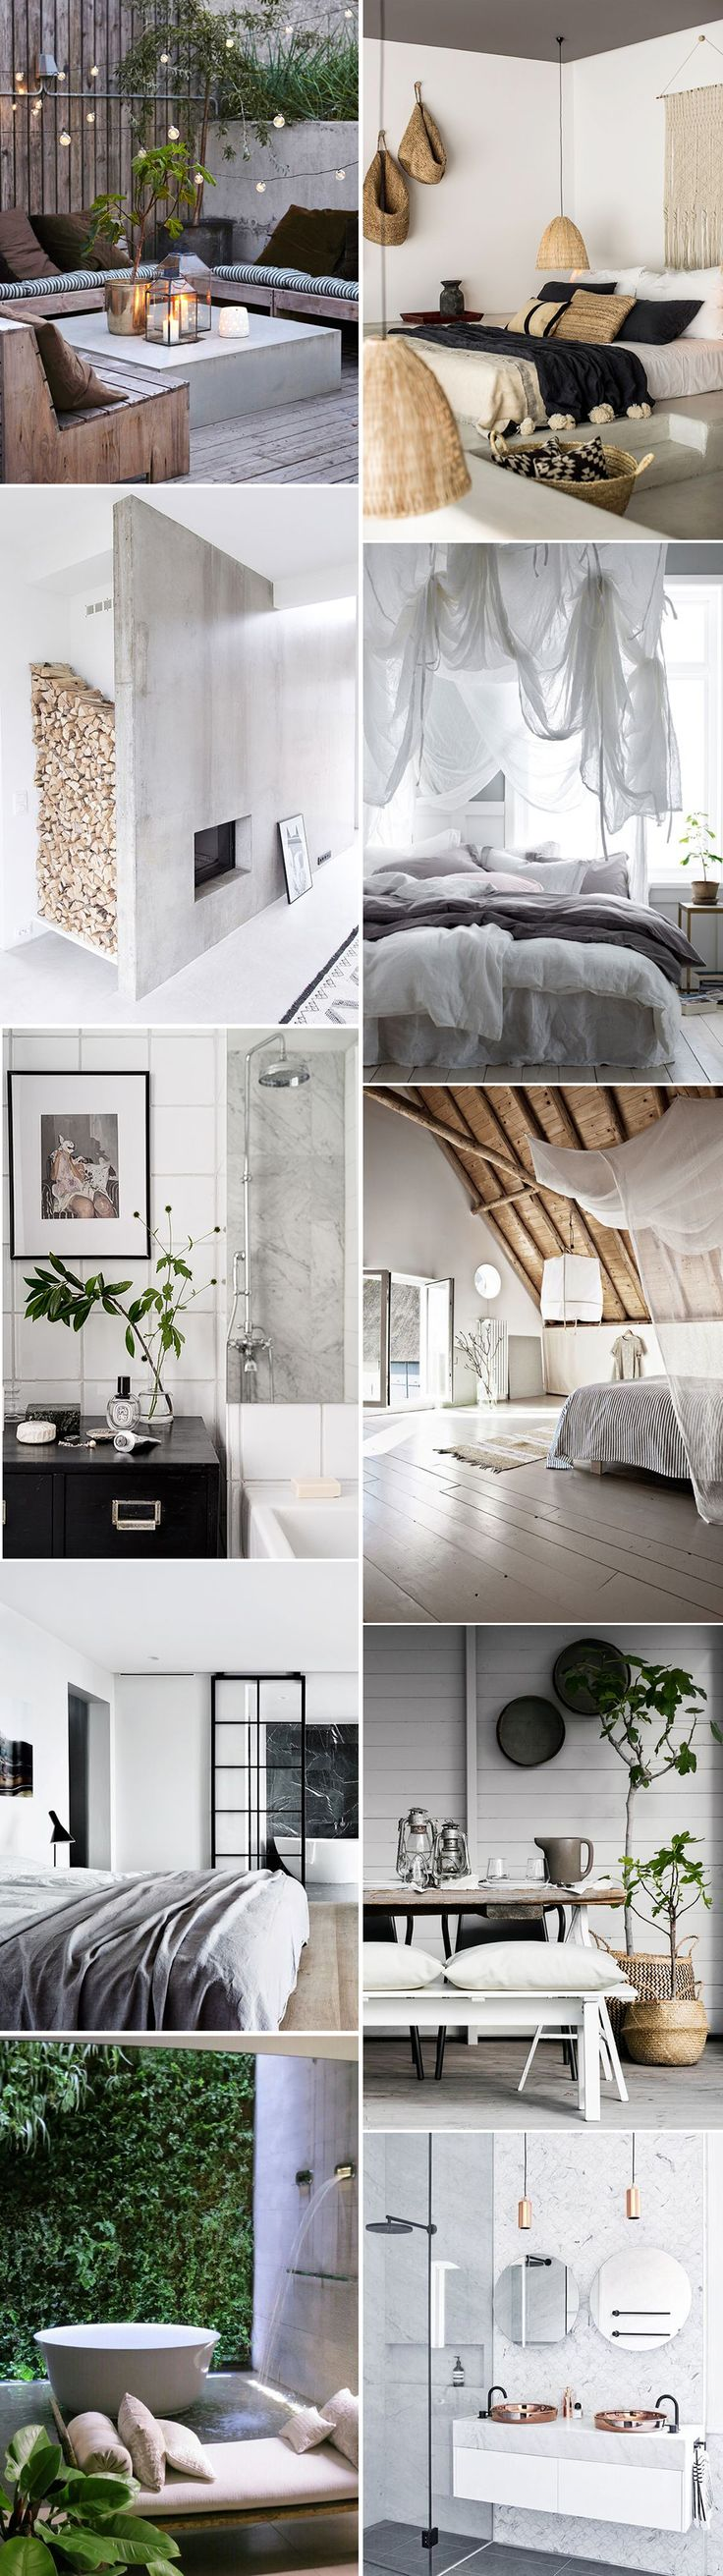 bykiki-interior-inspiration.jpg (980×3492)